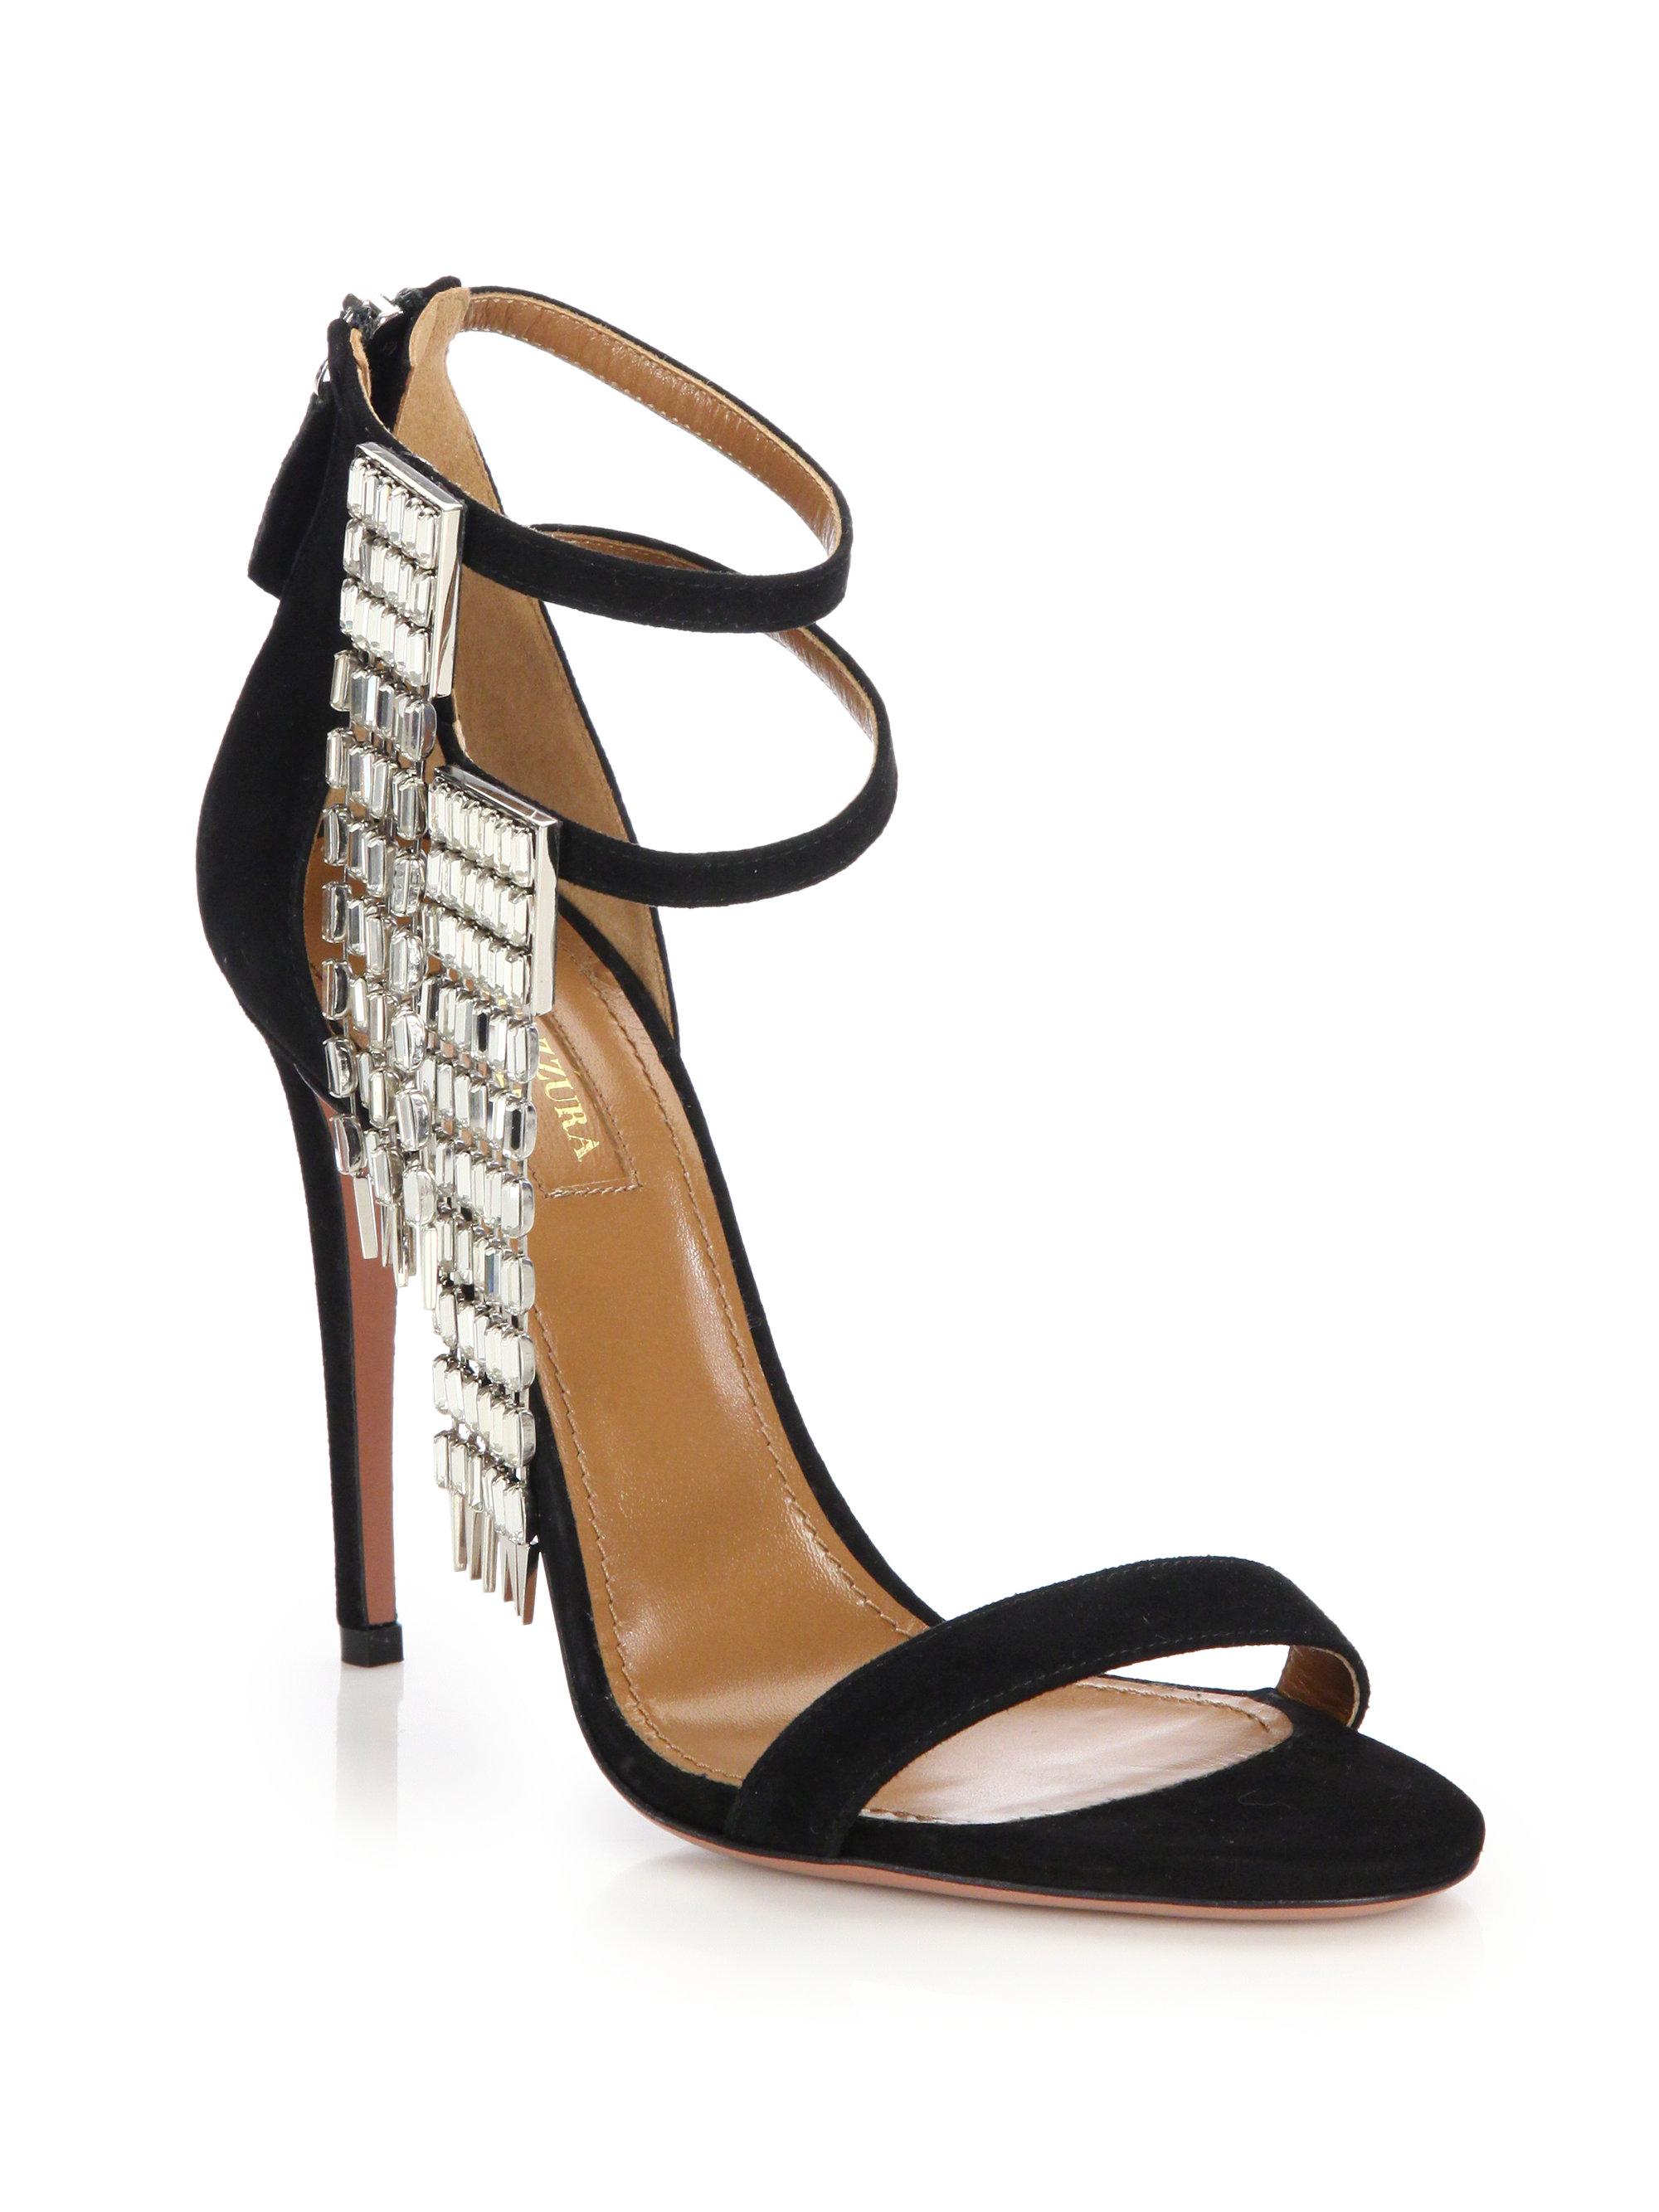 Lyst Aquazzura My Desire Jeweled Fringe Suede Sandals In